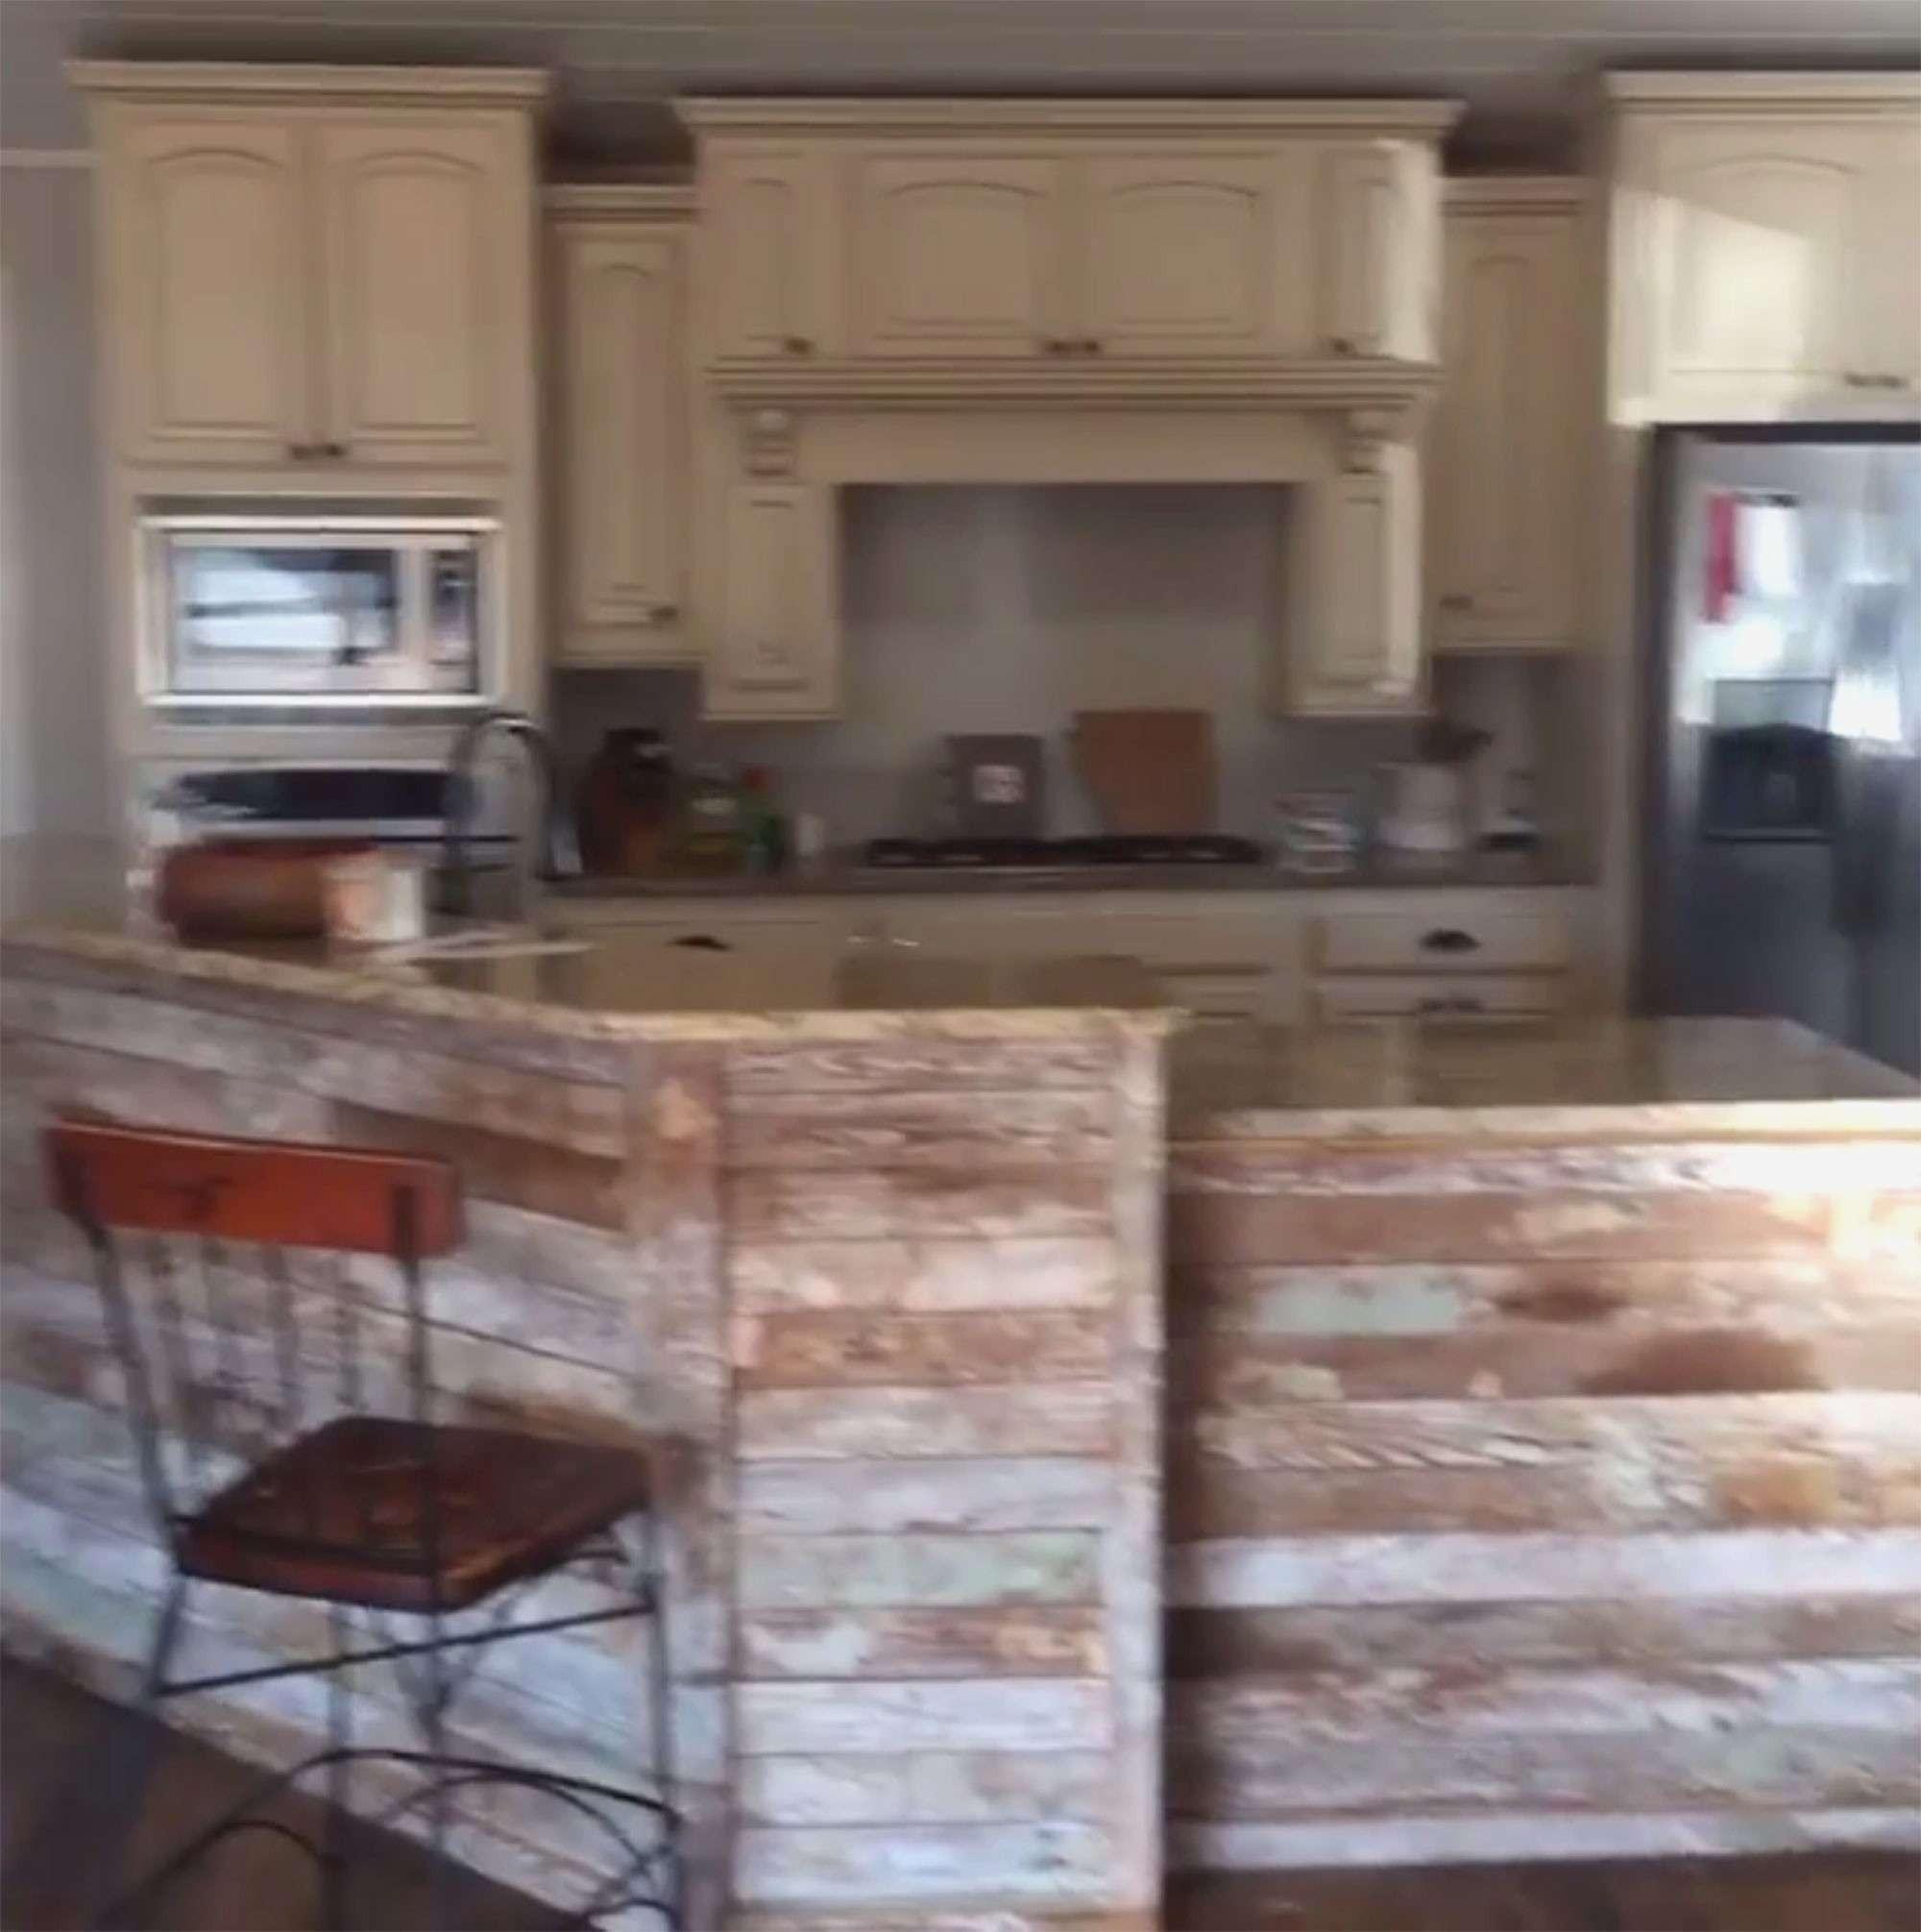 Images Of Hardwood Floors Of Kitchen Hardwood Floors Vs Tile Best Of D21c9c917d F06d592a0f 300 In Kitchen Hardwood Floors Vs Tile Fresh Kitchens New Kitchen Kitchens Unlimited Kitchens Unlimited 0d